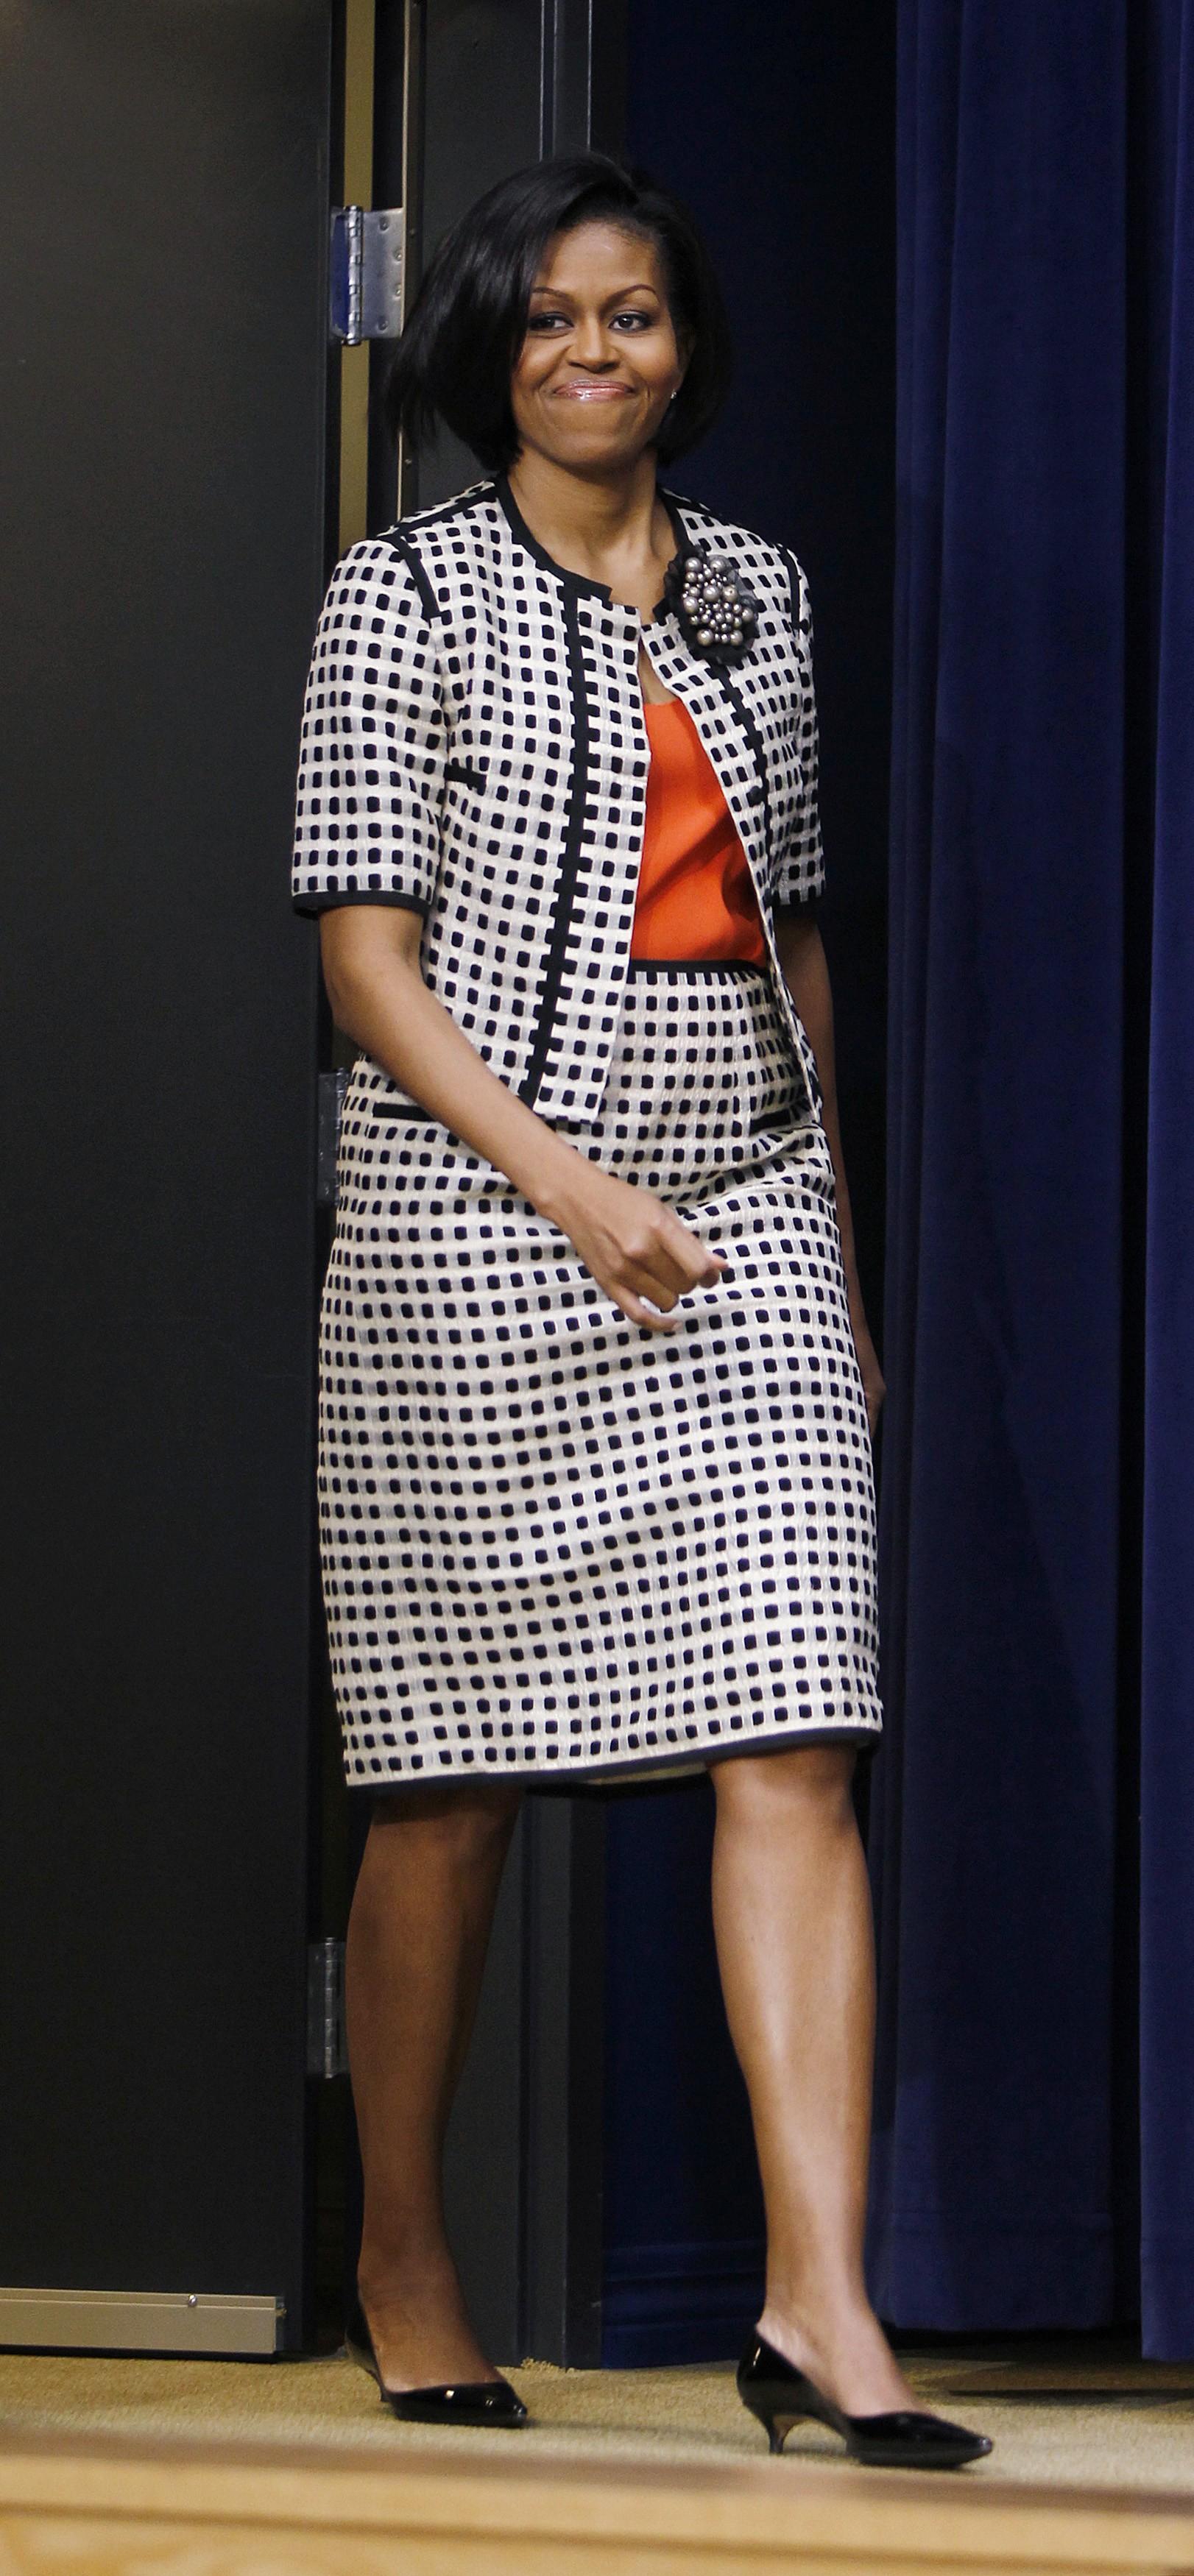 Michelle Obama Shoes Kitten Heels